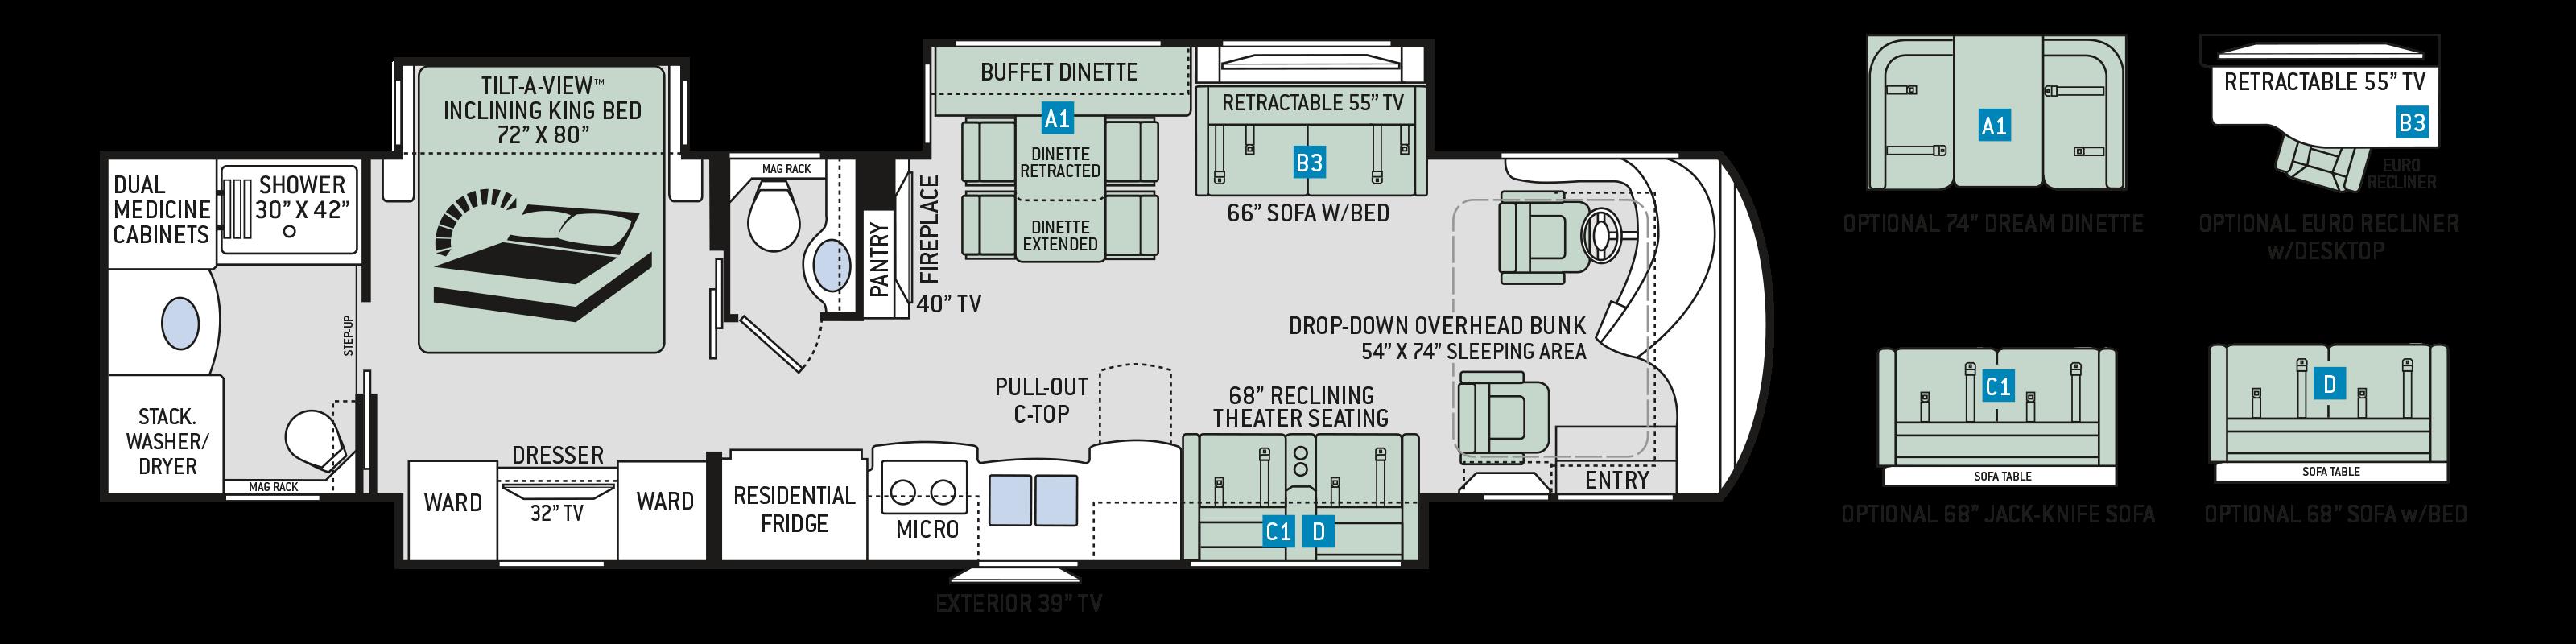 Tuscany Heating Diagram Wiring Solar Simple Electrical Amana Refrigerator On Oil Furnace Older Floor Plans 40rt Trailmaster Trailer